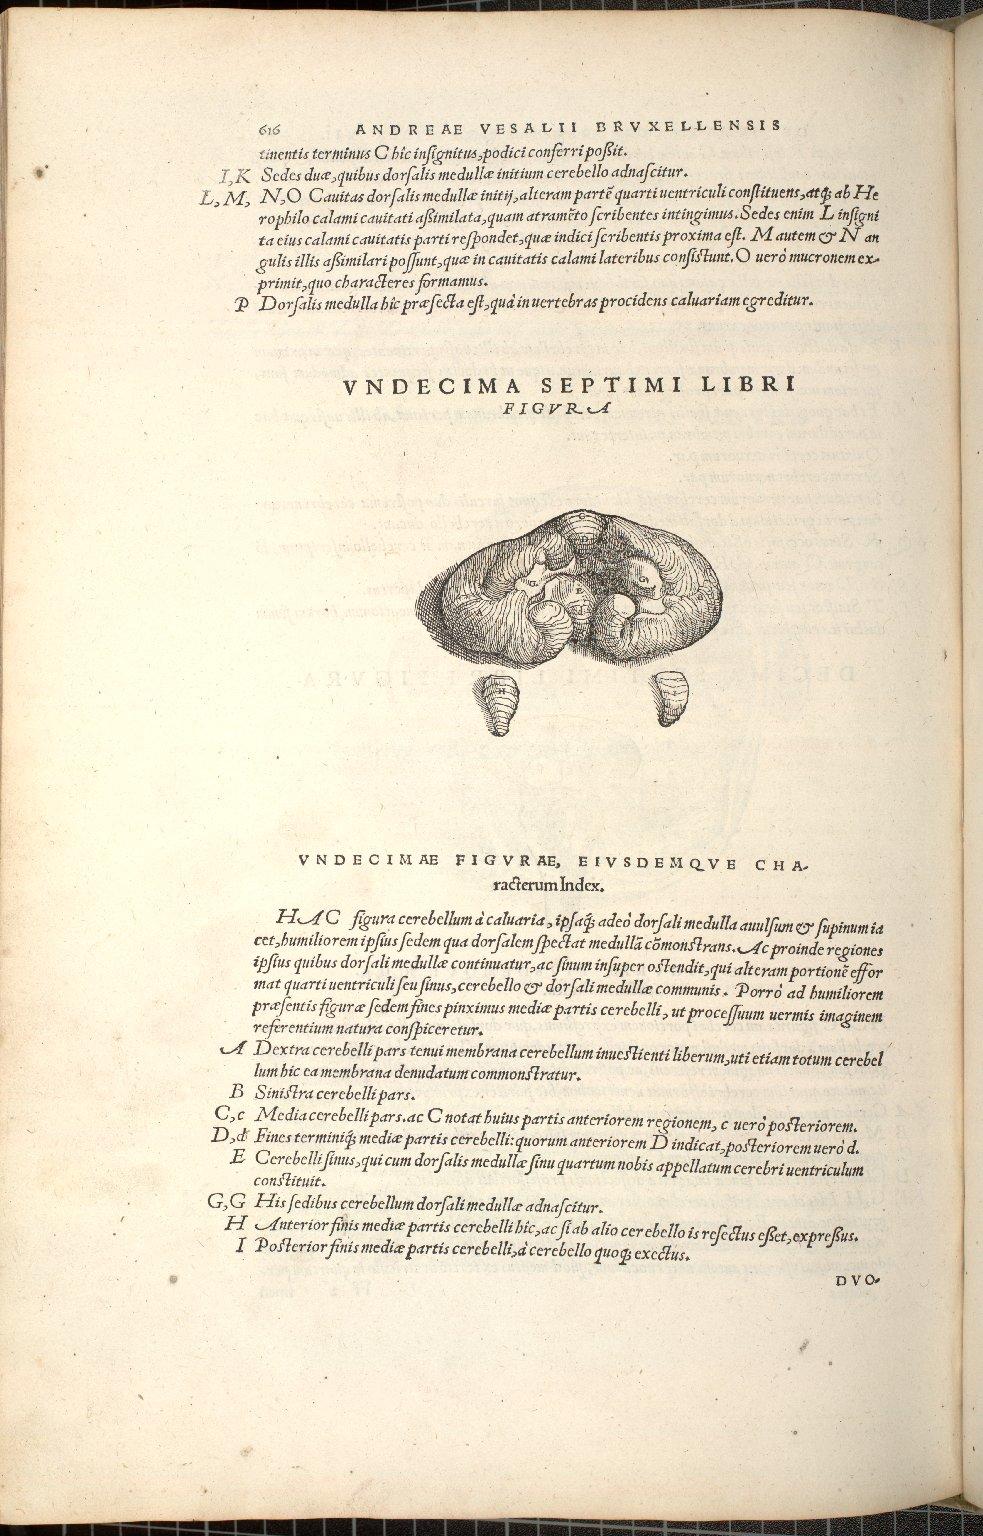 Undecima Septimi Libri Figura